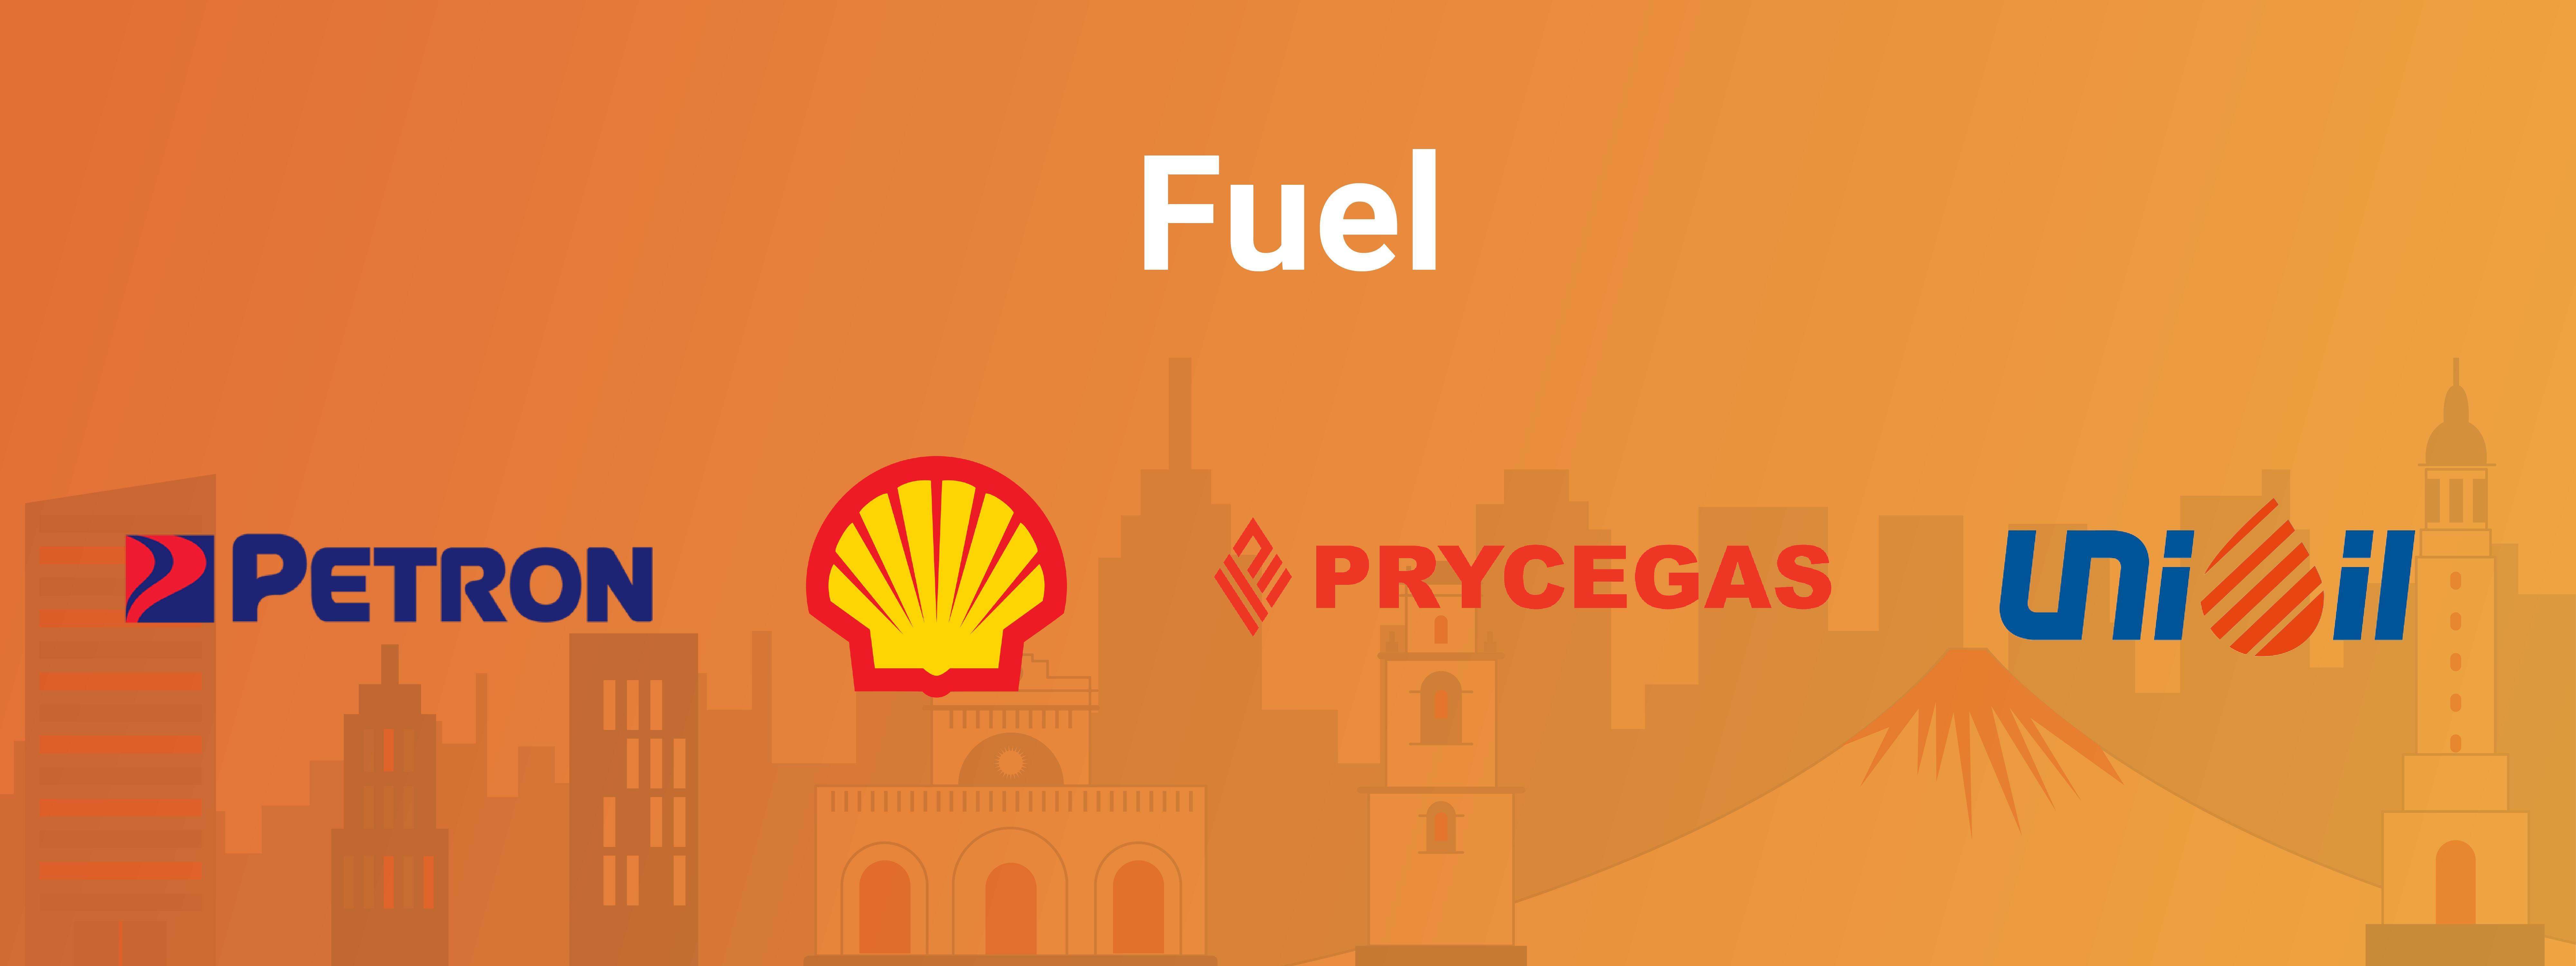 Panalomove_Slider_Fuel-07_Cebu (1)